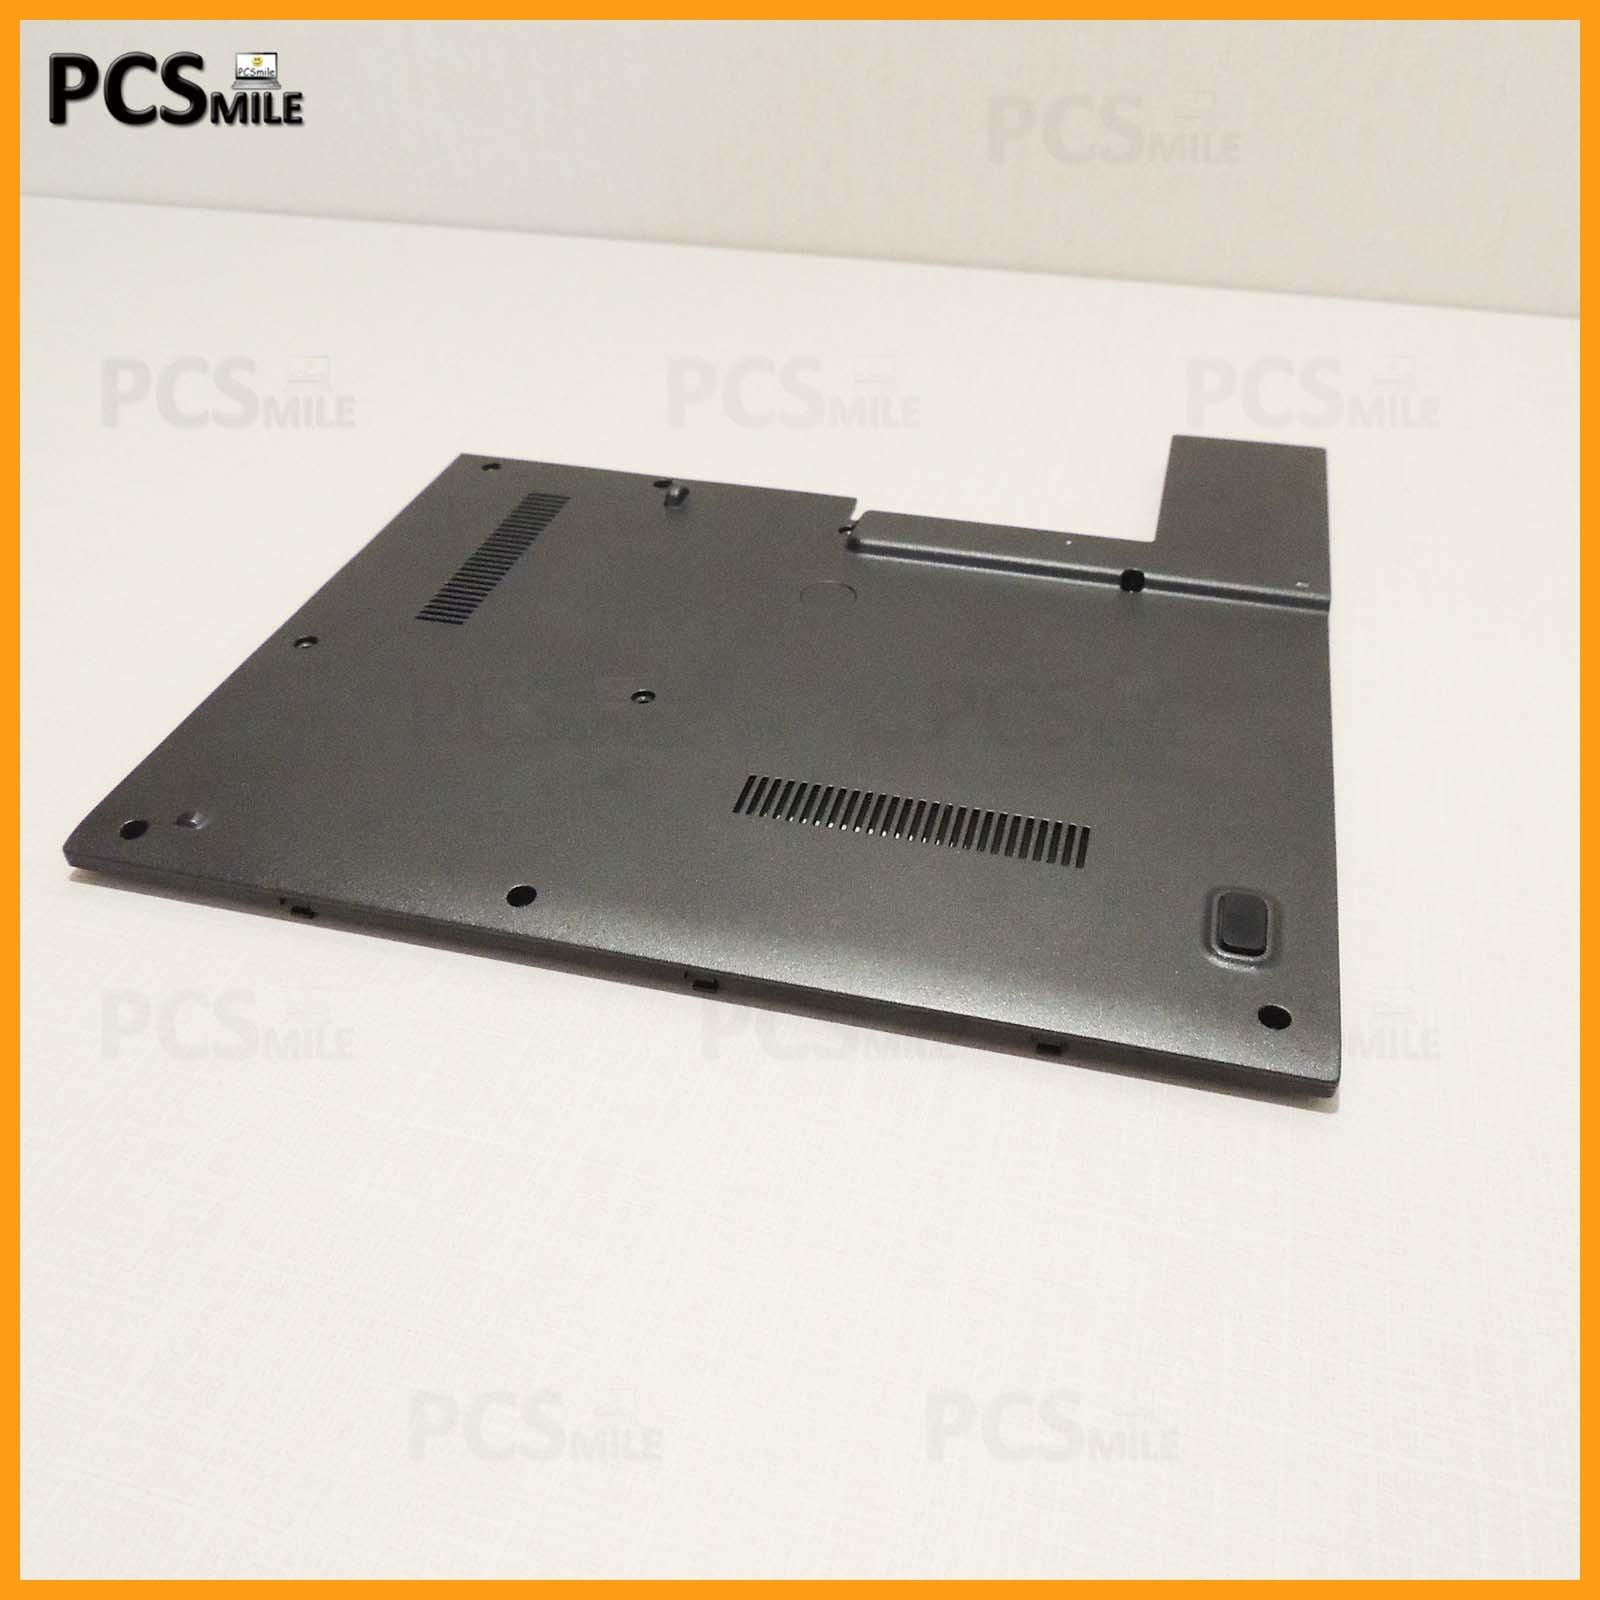 Tappo hard disk RAM ventola Amilo PA 3553 MS2242 Scocca Fujitsu Siemens